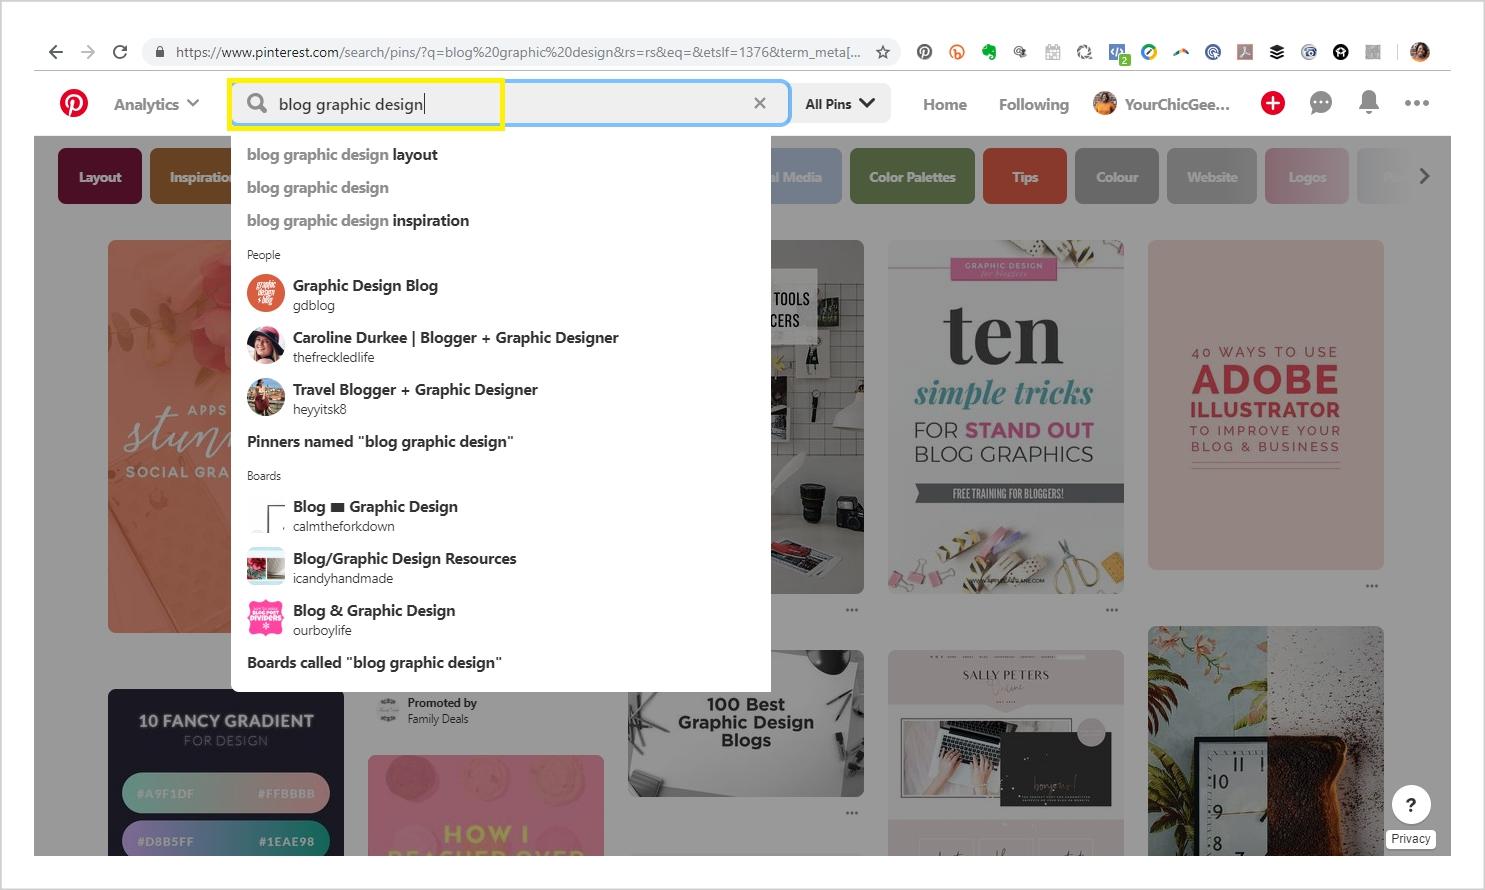 Pinterest Blog Graphic Design Search